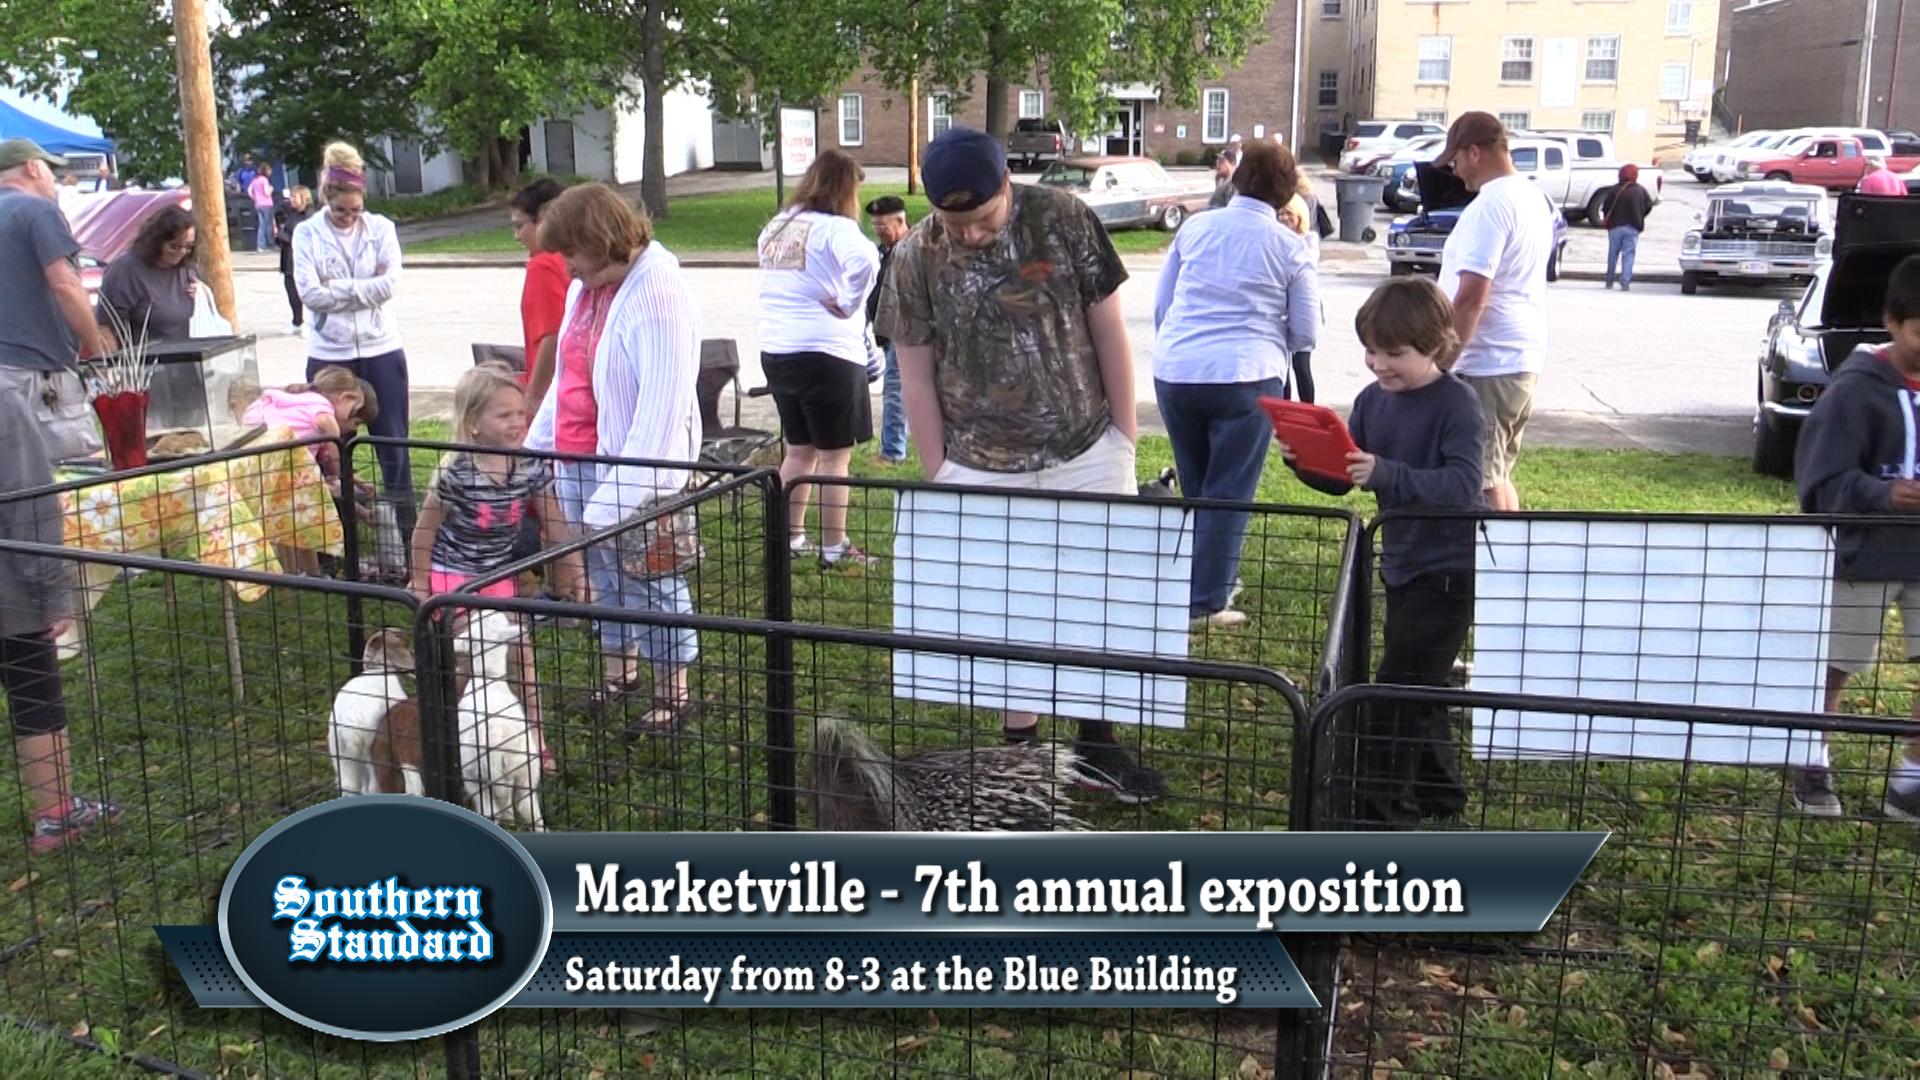 VIDEO - Marketville 2017